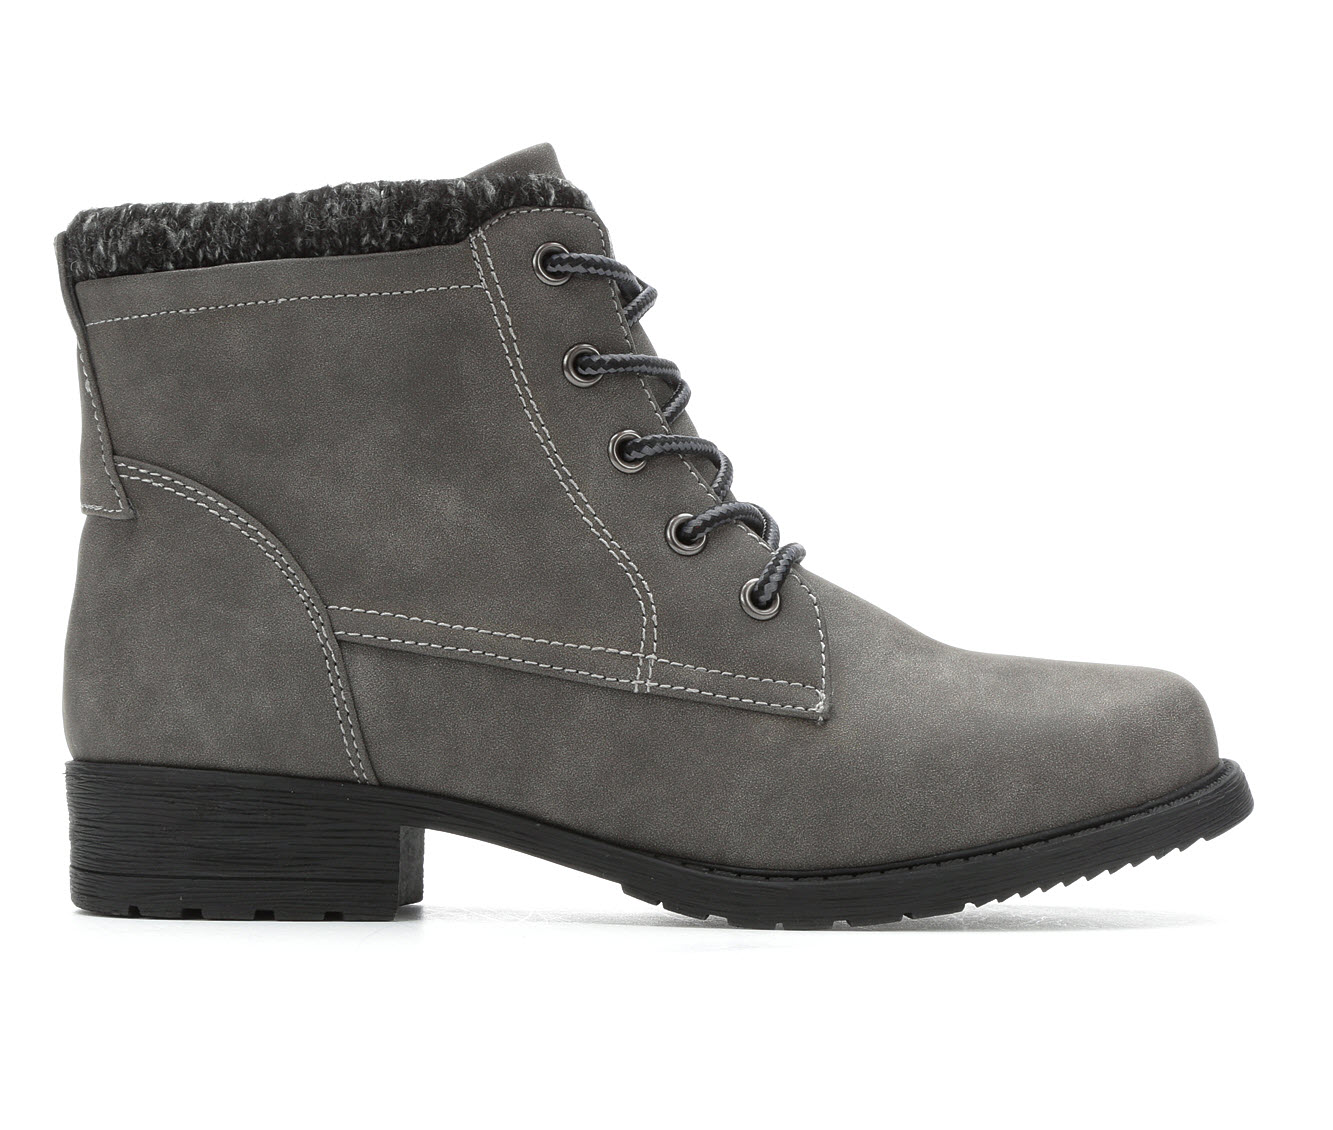 Sporto Leslie Women's Boot (Gray Faux Leather)